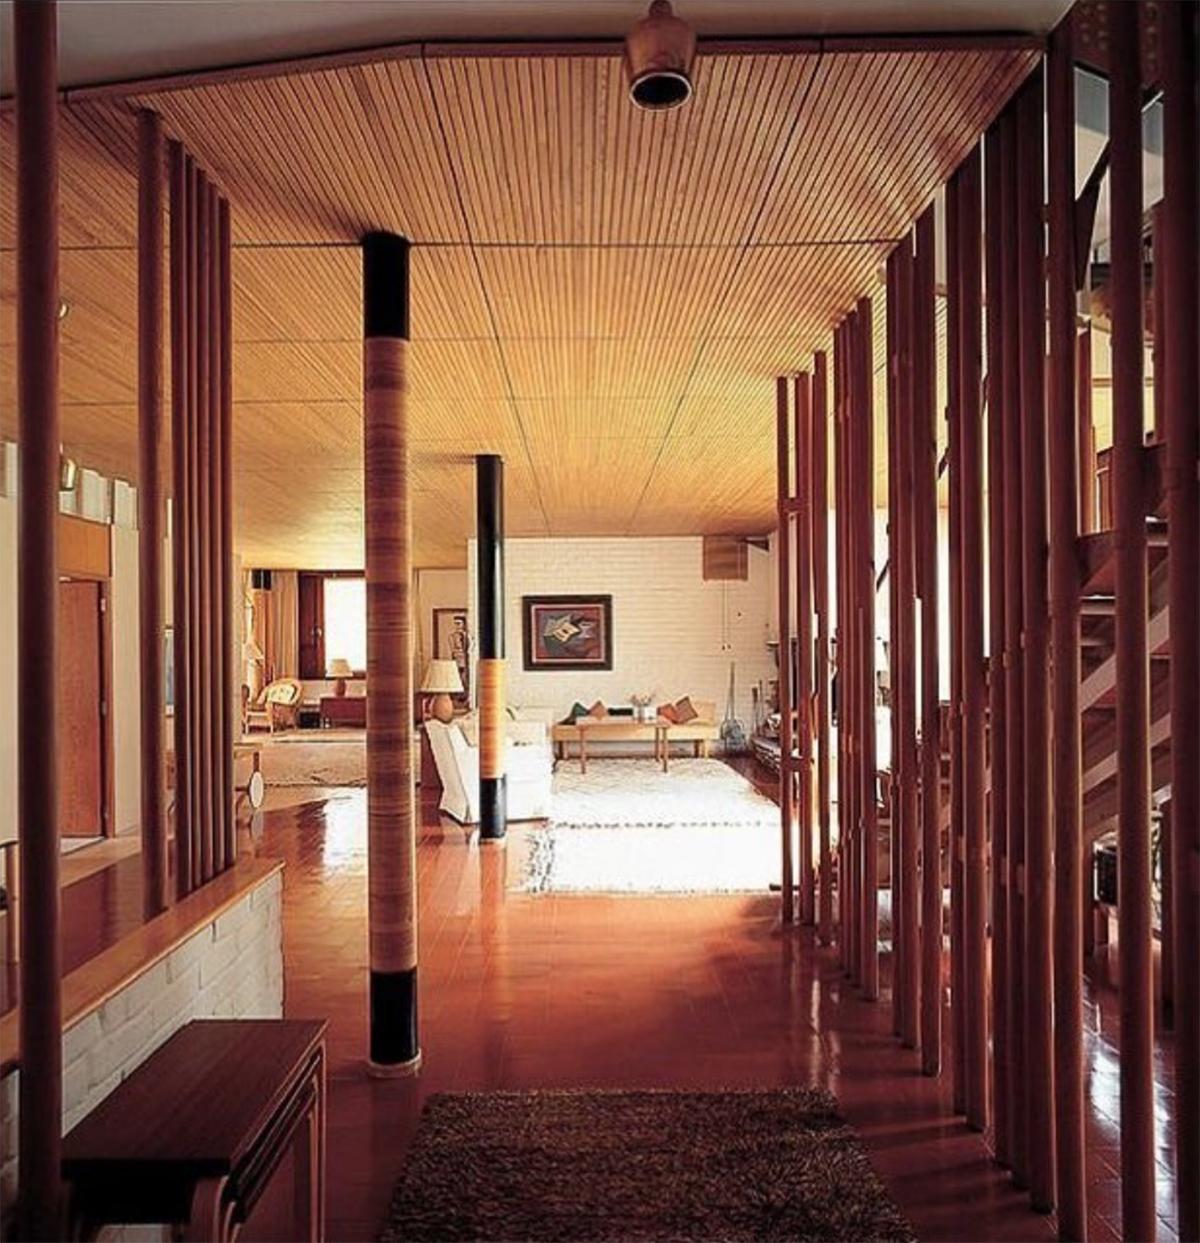 Villa Mairea by Alvar Aalto - photo from Lesfew